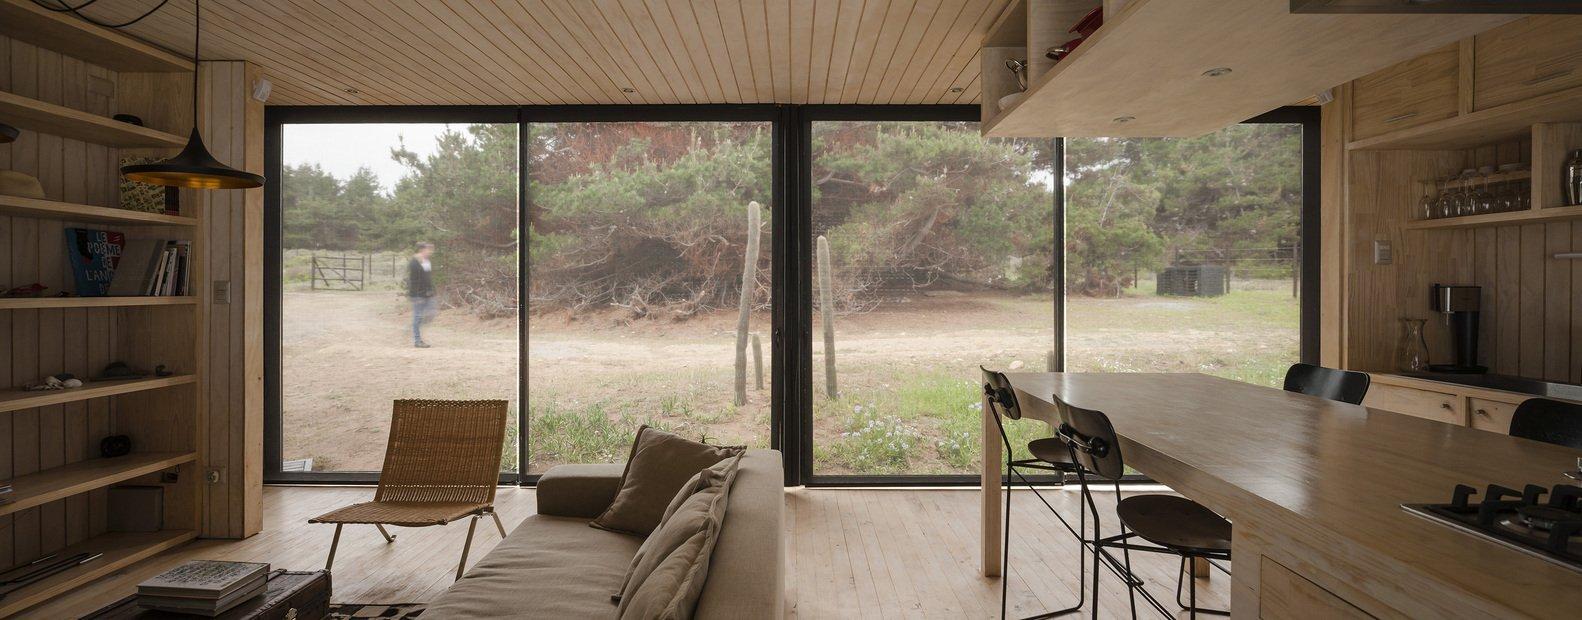 Remote House - Modular House - Felipe Assadi - Chile - Kitchen Dining Area - Humble Homes